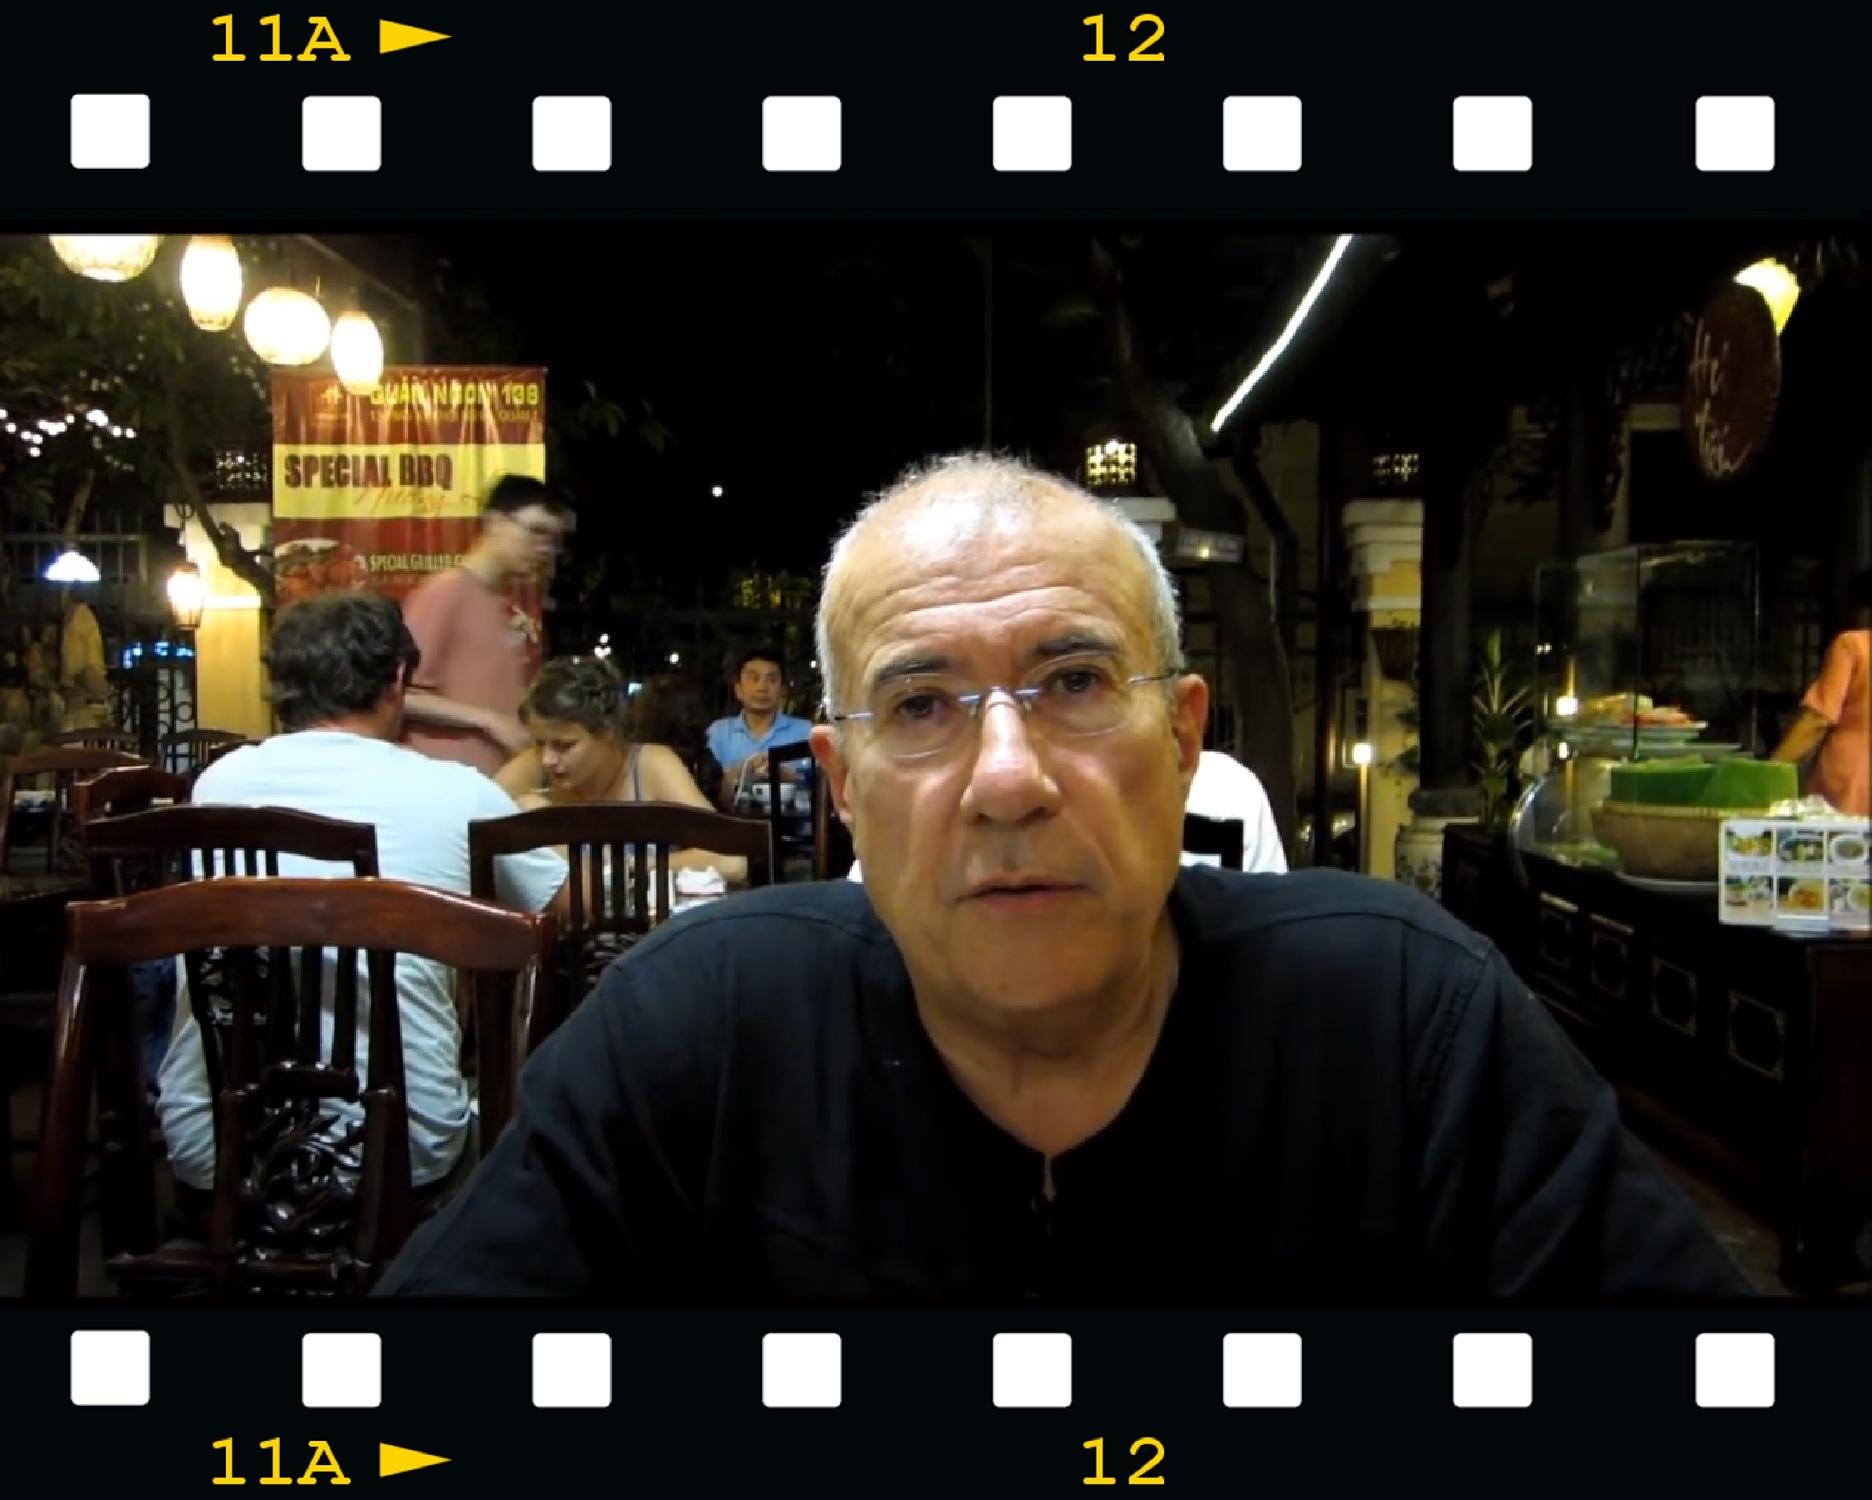 VIDEO_Année 2016 - Nos 3 prochains bancs d'essais_small